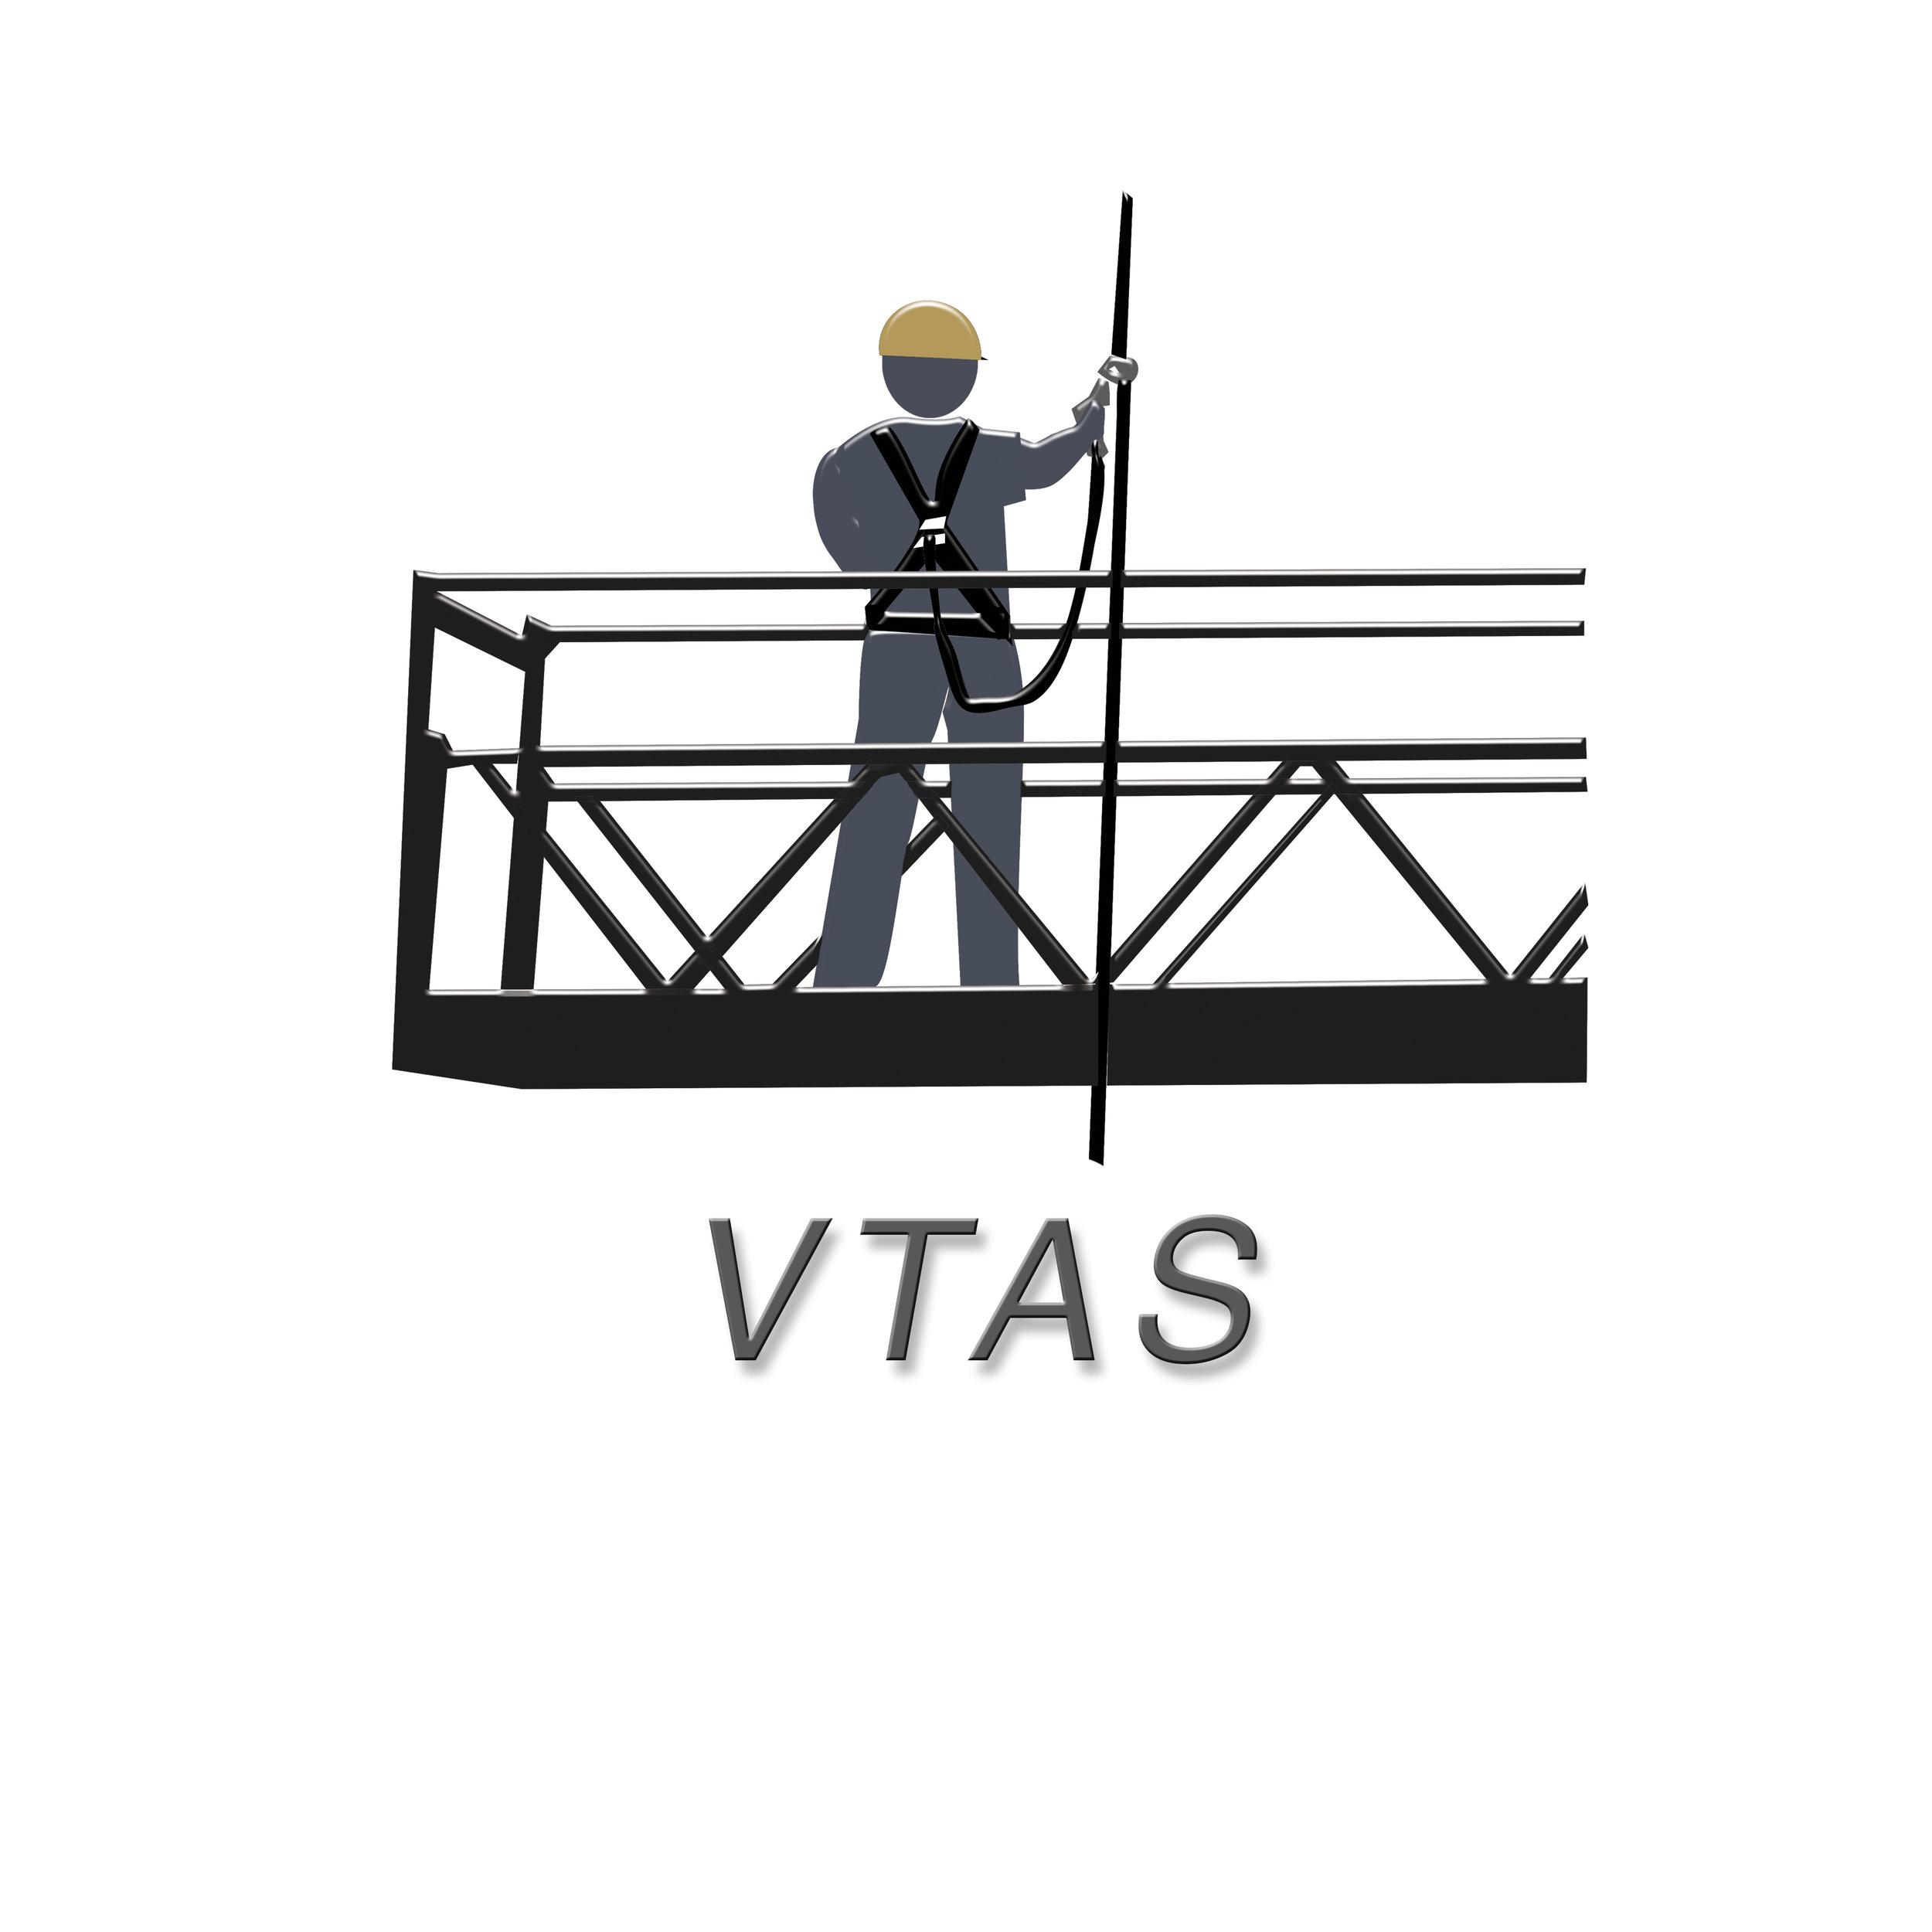 VTAS square logo.jpg